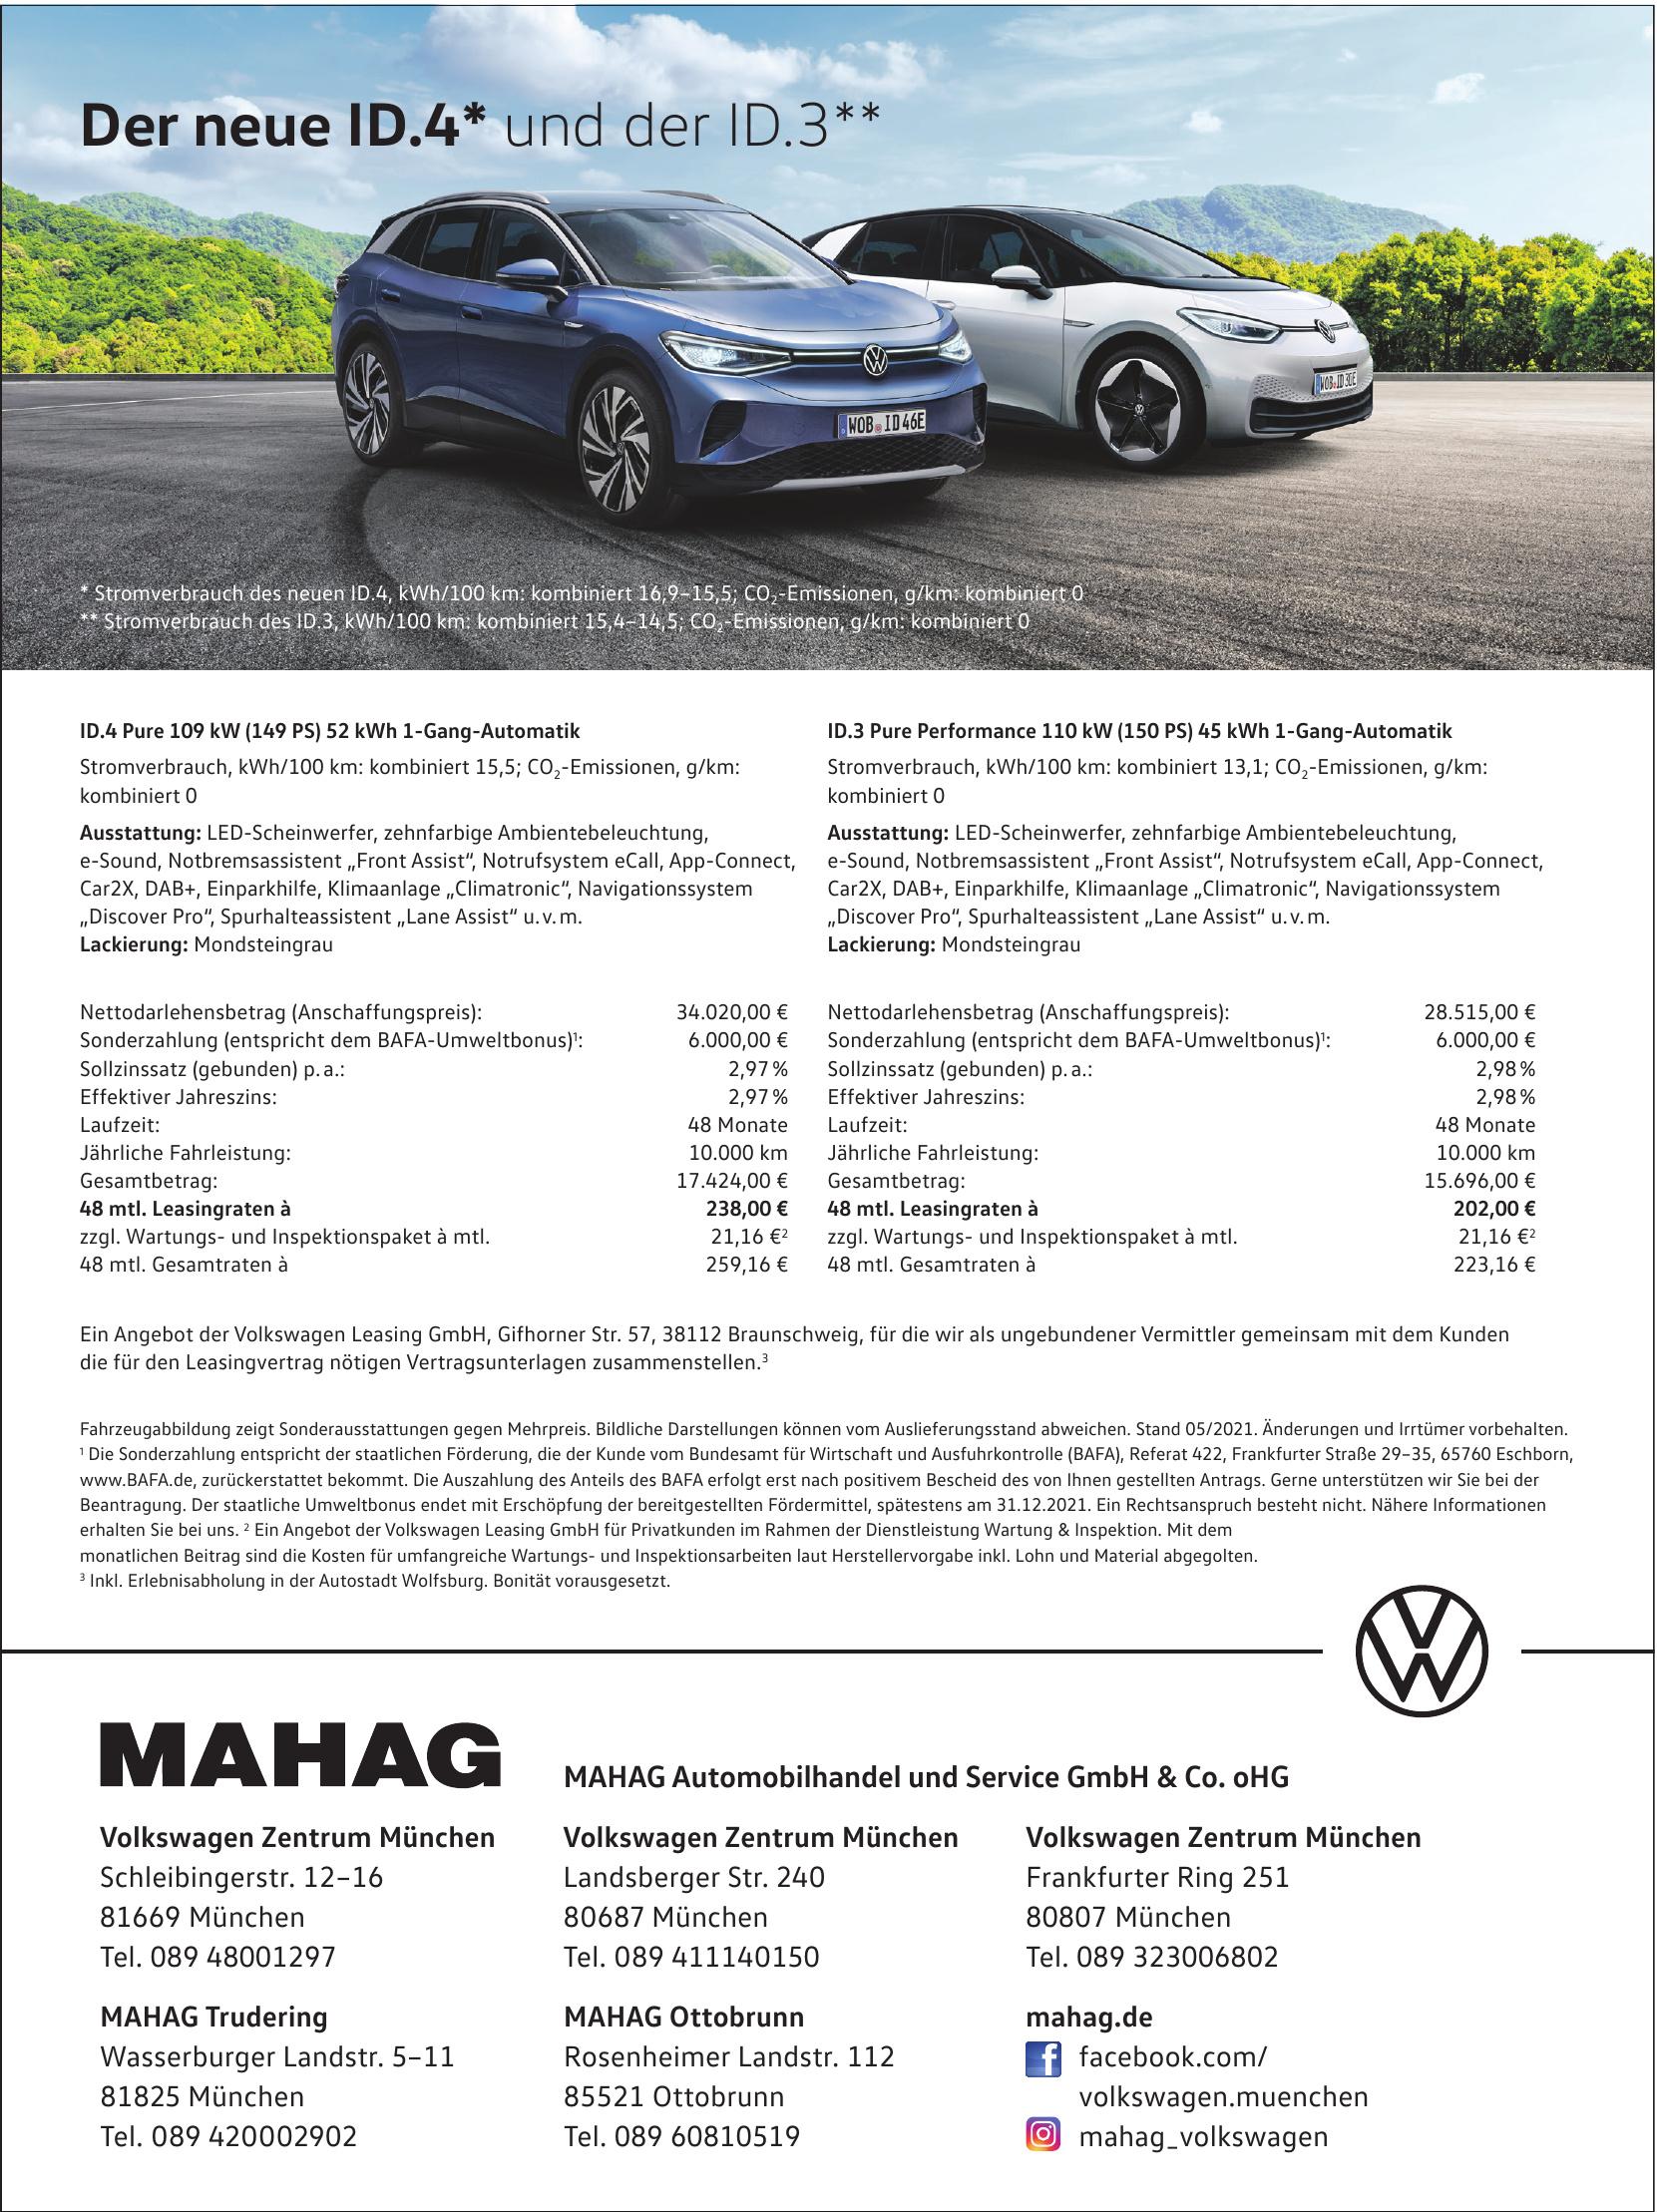 MAHAG Automobilhandel und Service GmbH & Co. oHG